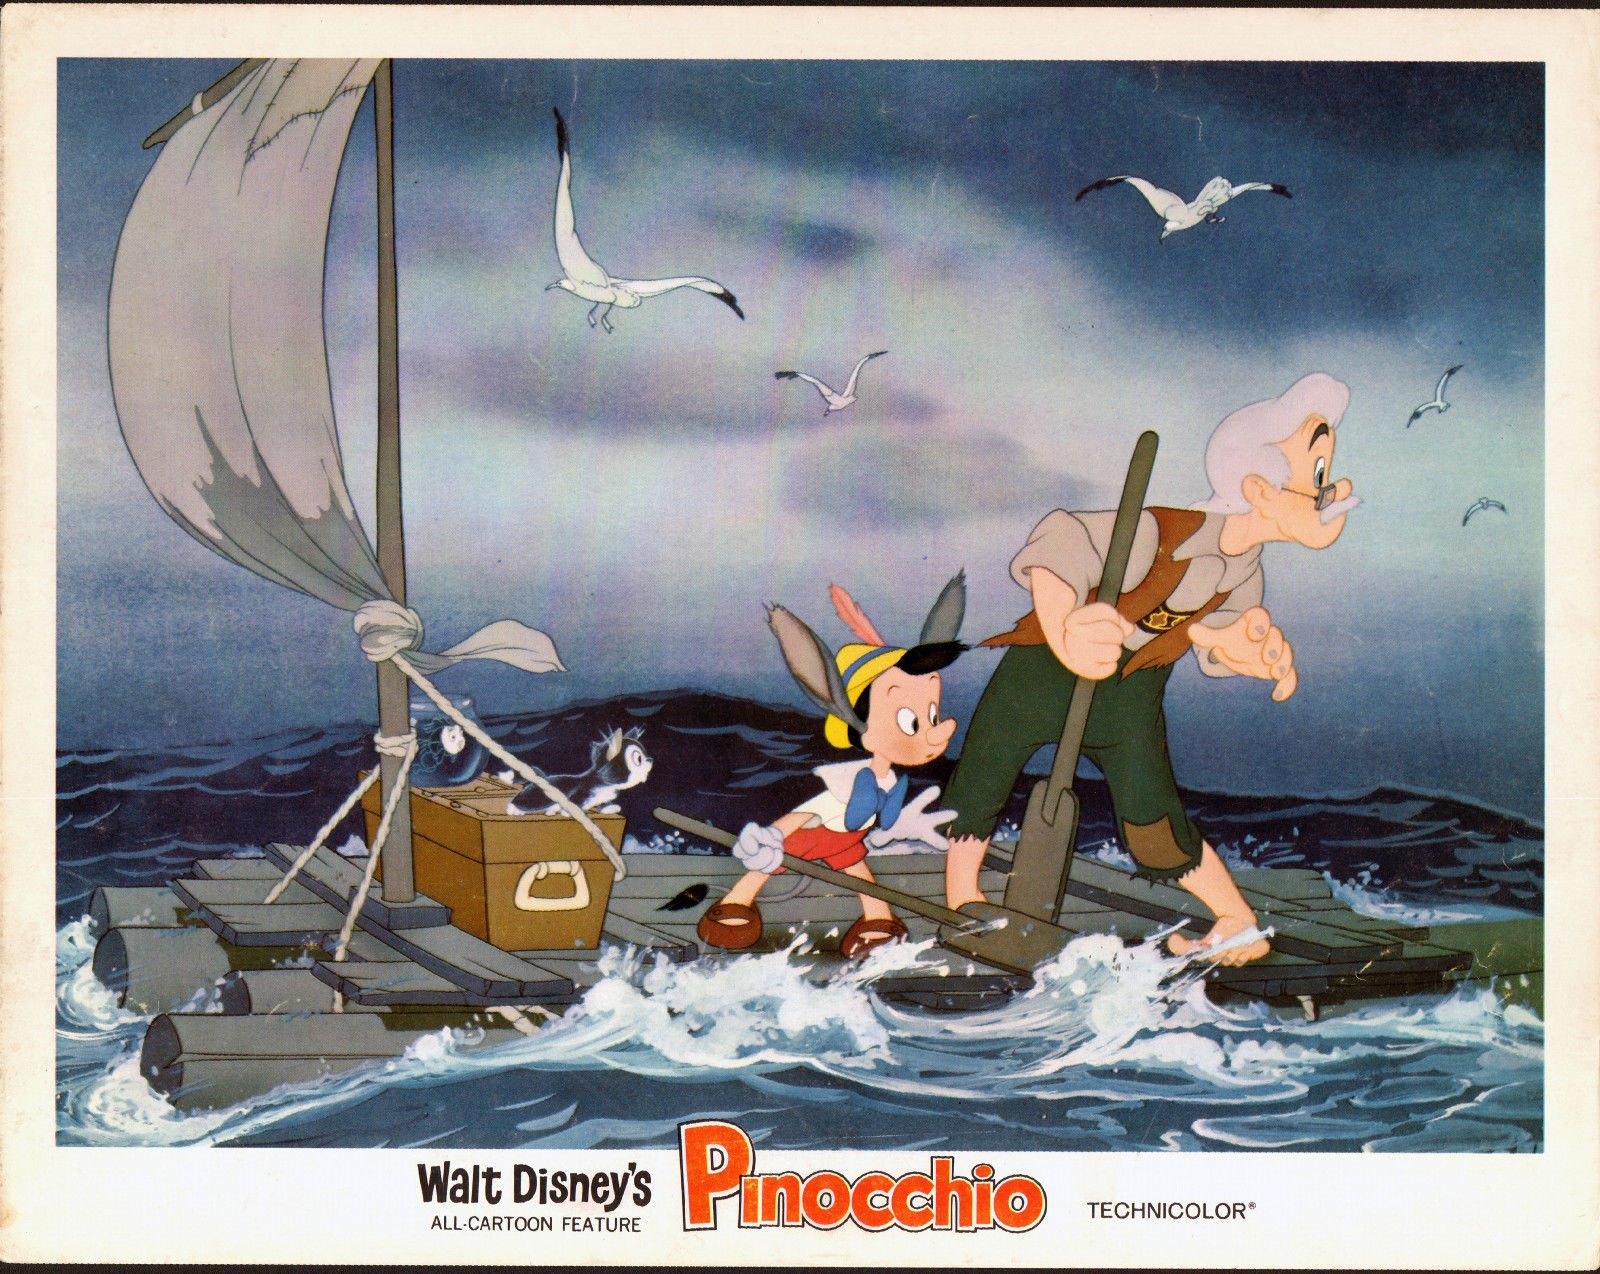 Disney Lobby Cards File:pinocchio Lobby Card.jpg